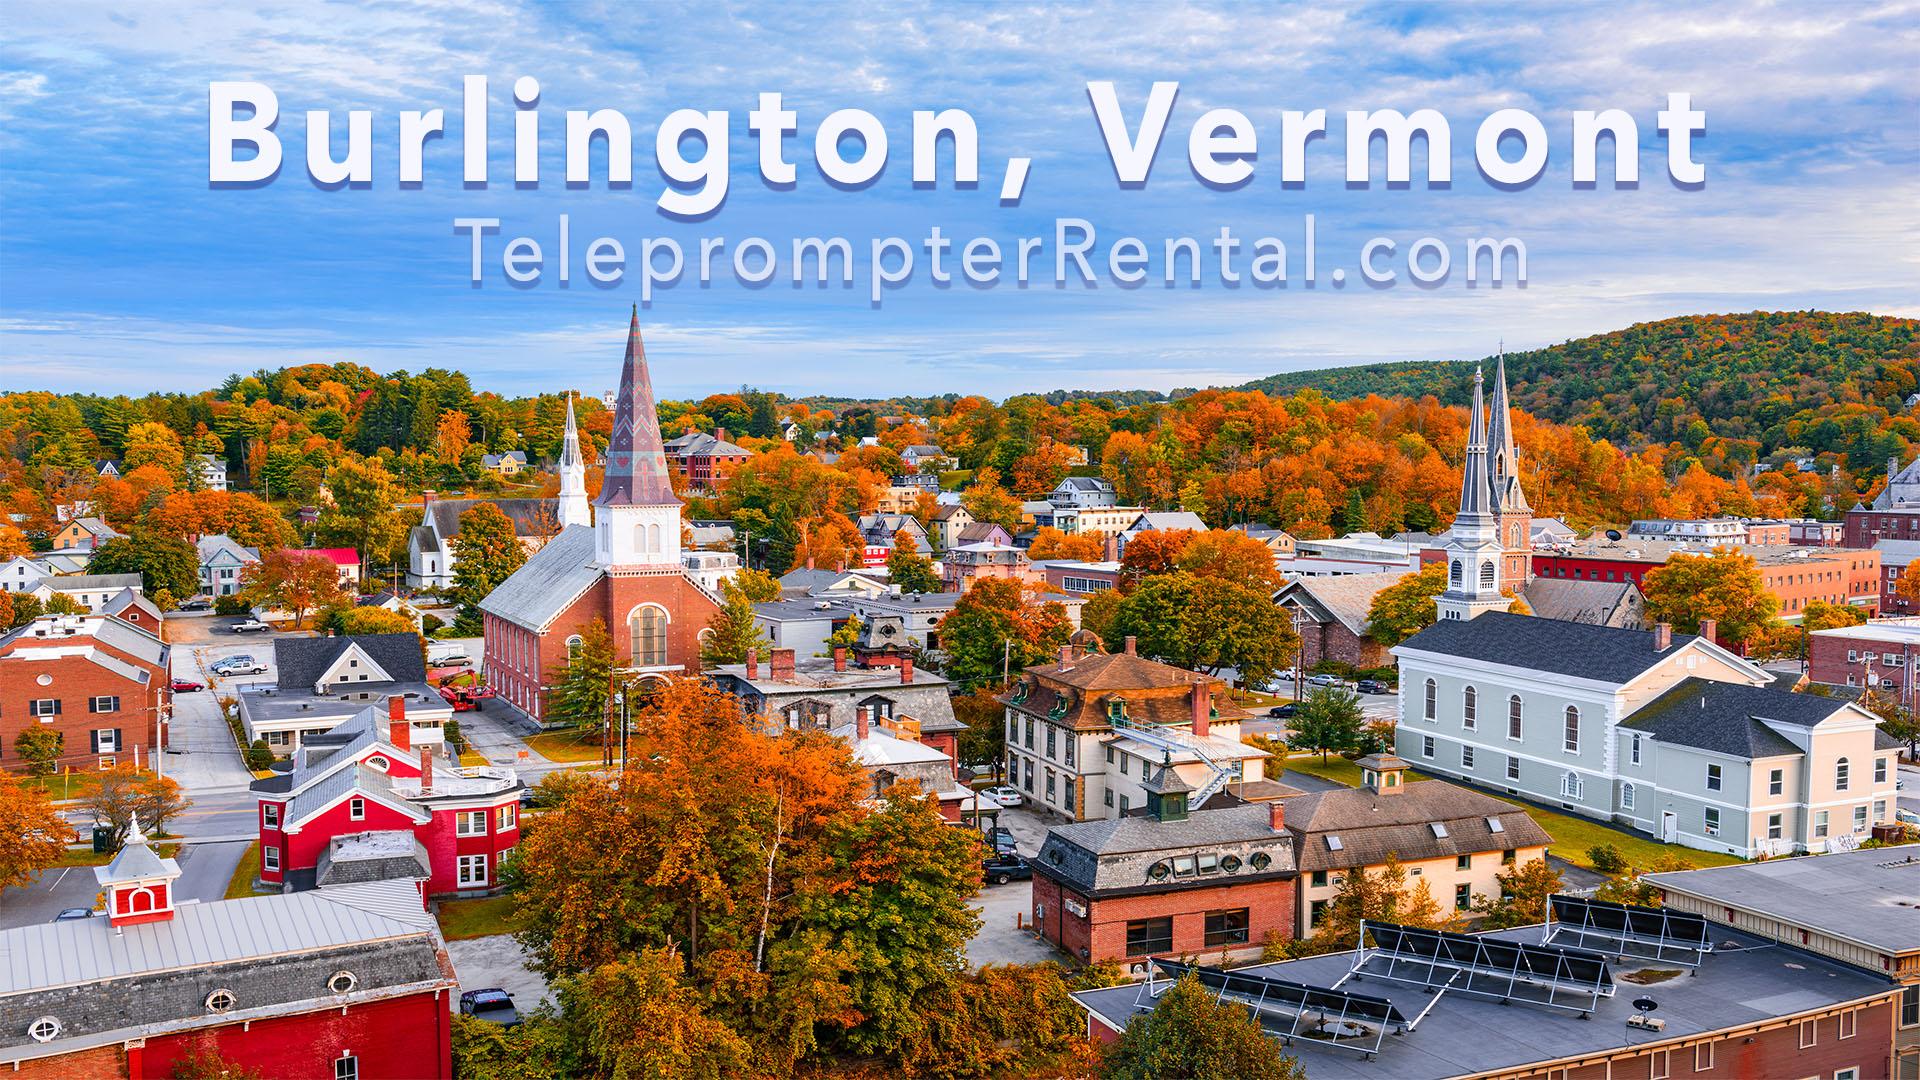 Burlington, Vermont - Teleprompter Rental